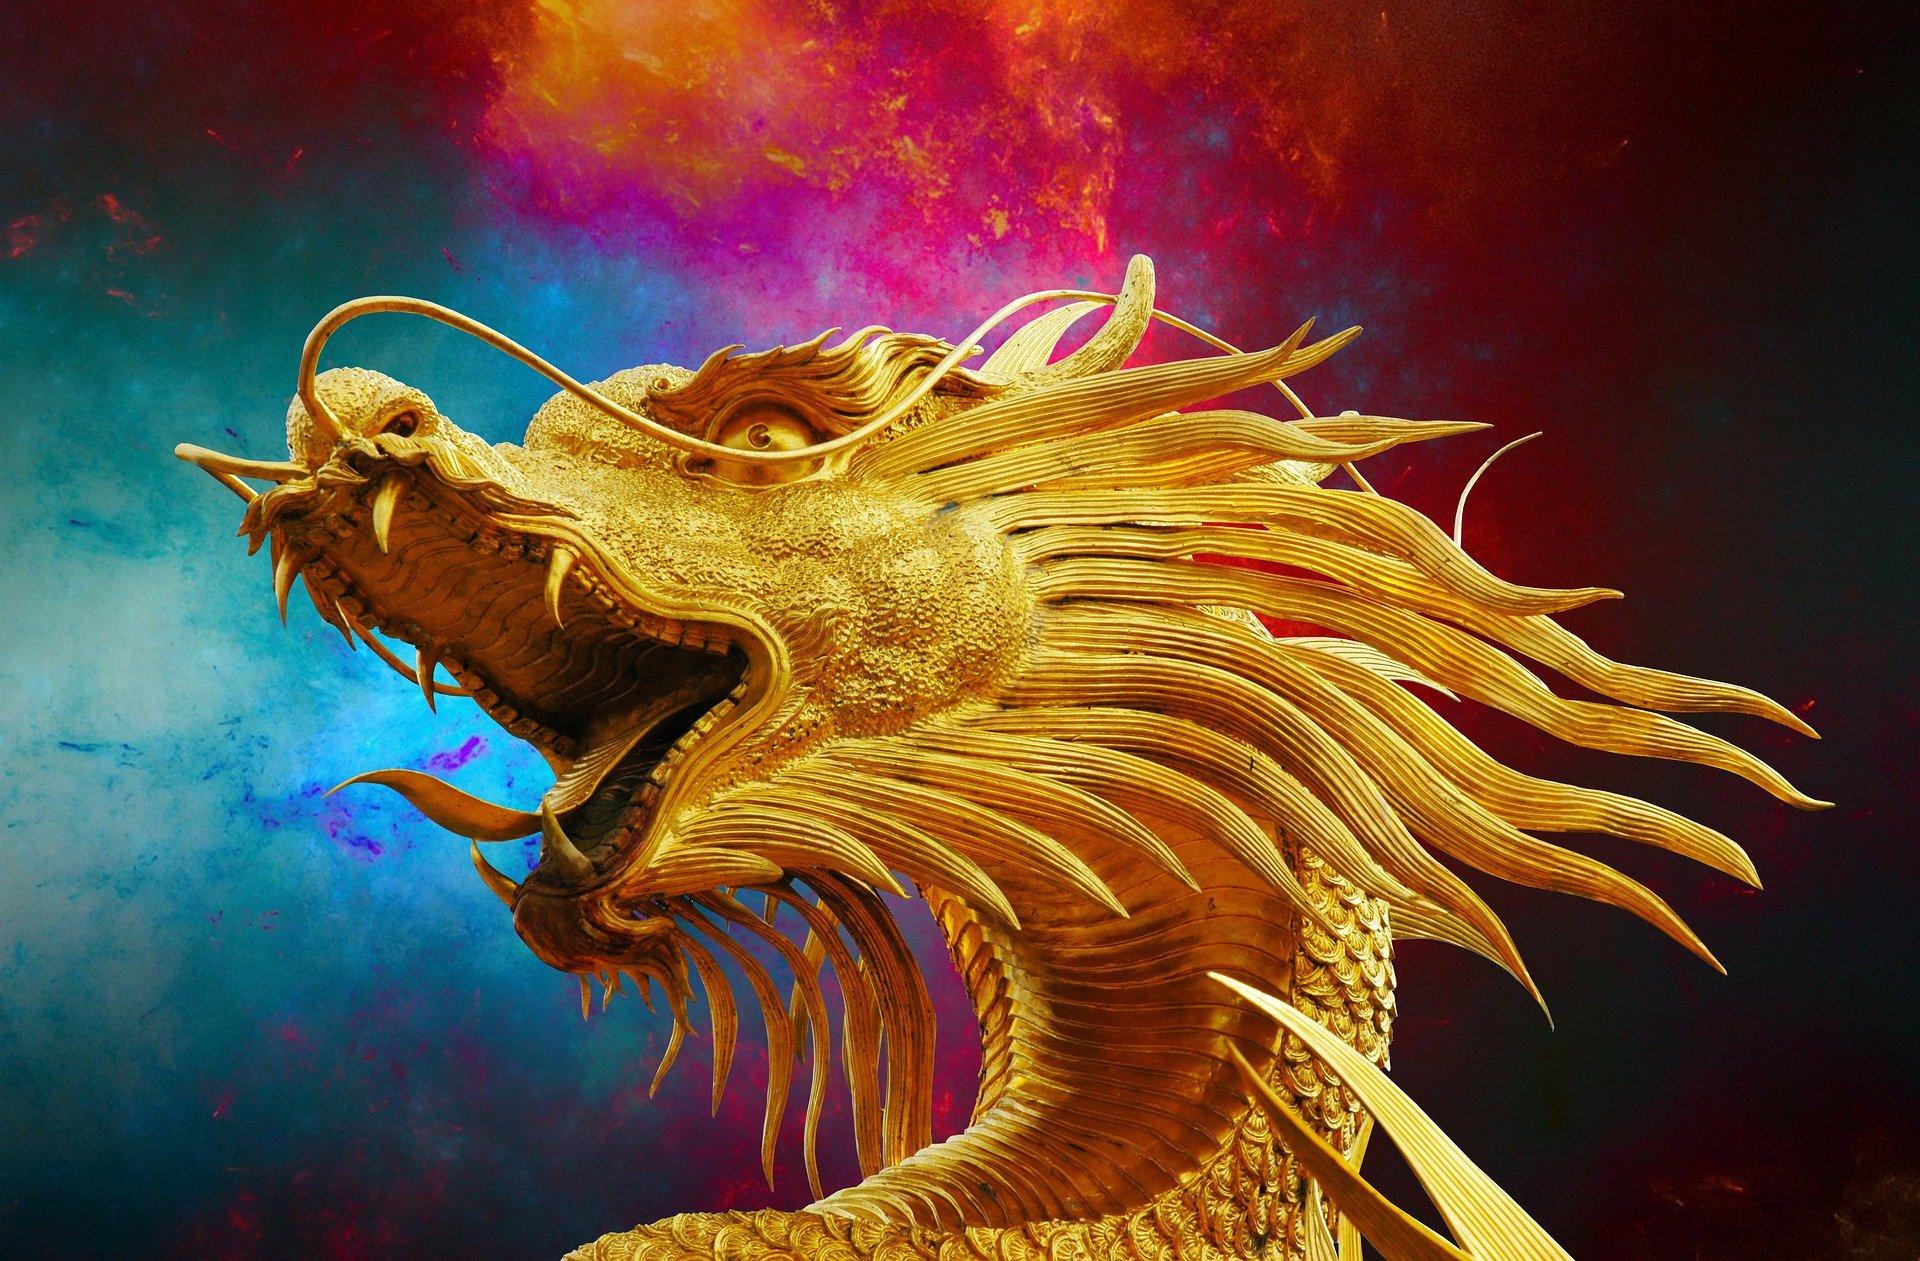 Drachen - Fantasiefigur